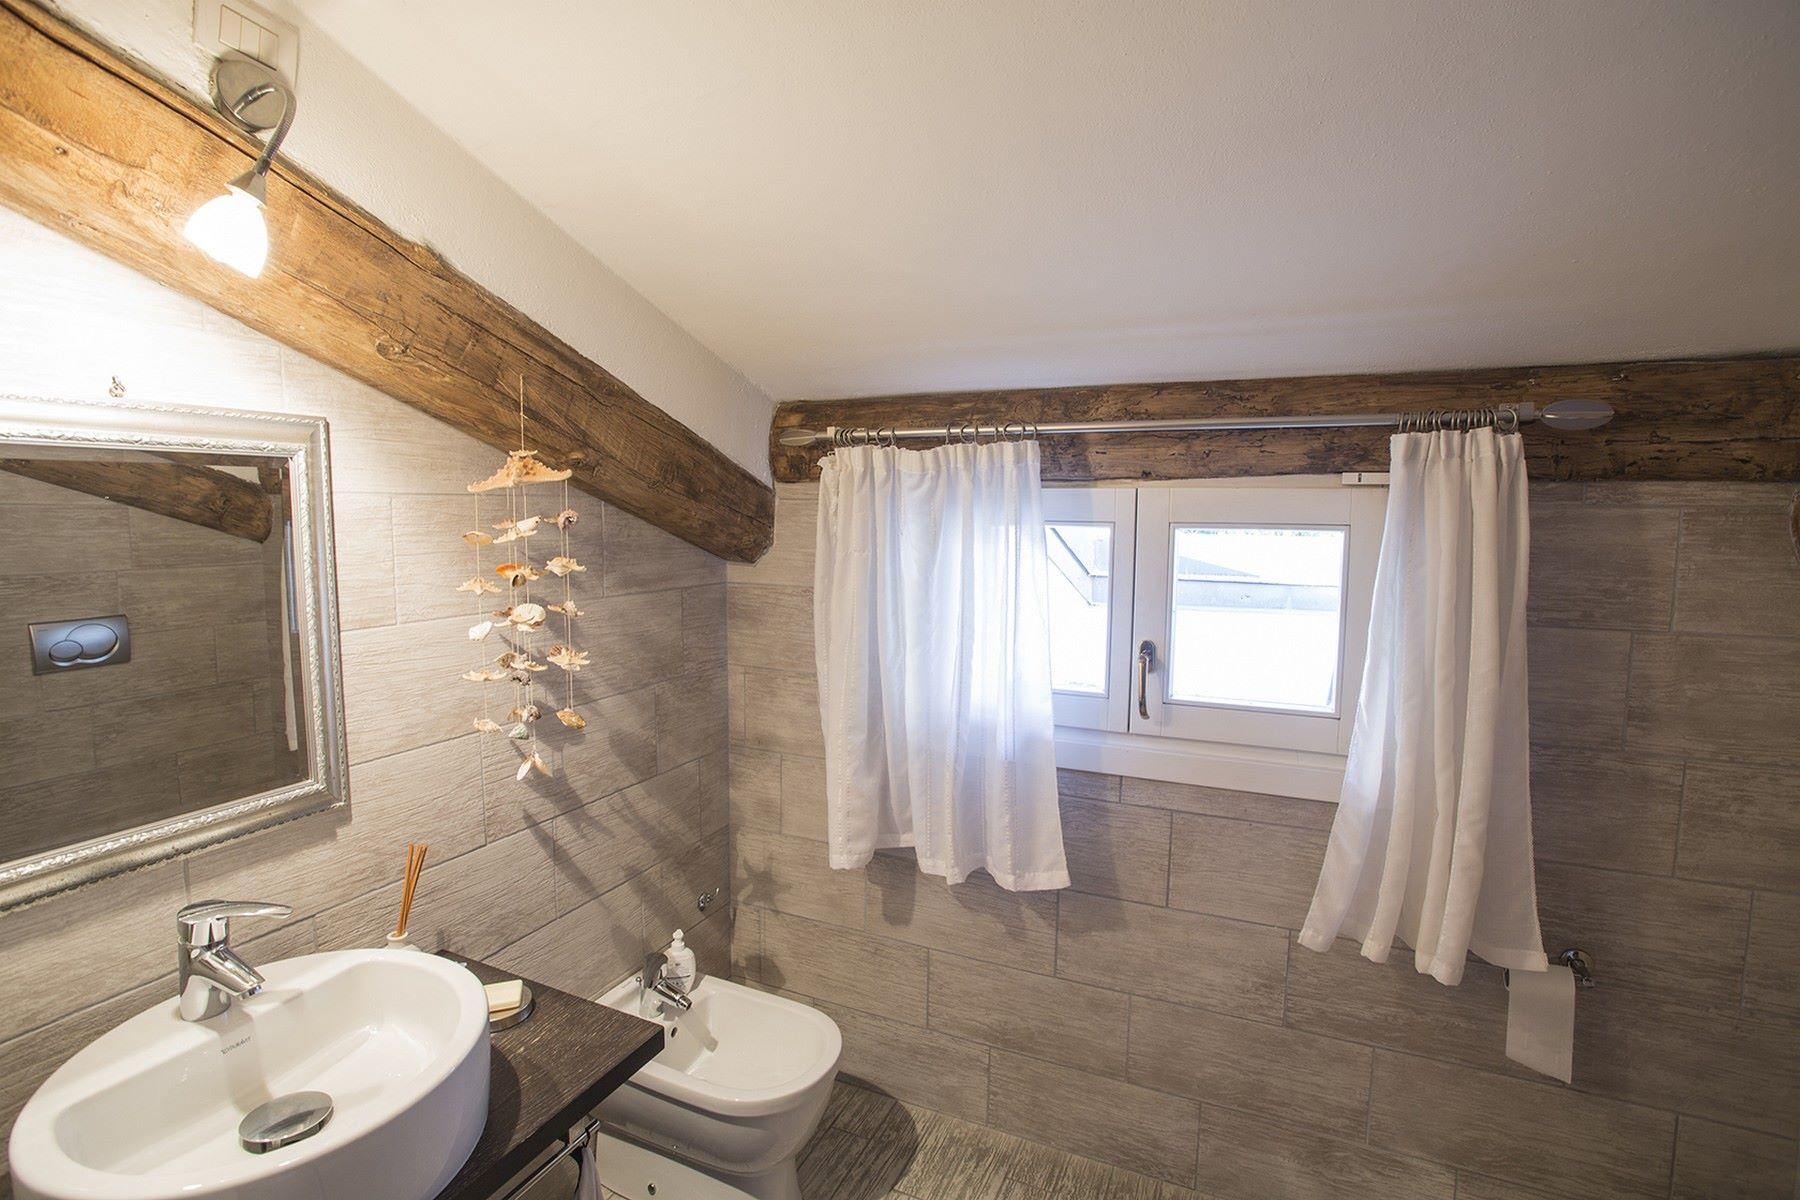 Additional photo for property listing at Extraordinary modern villa with infinity pool Via Statale Regina Gera Lario, Como 22010 Italie